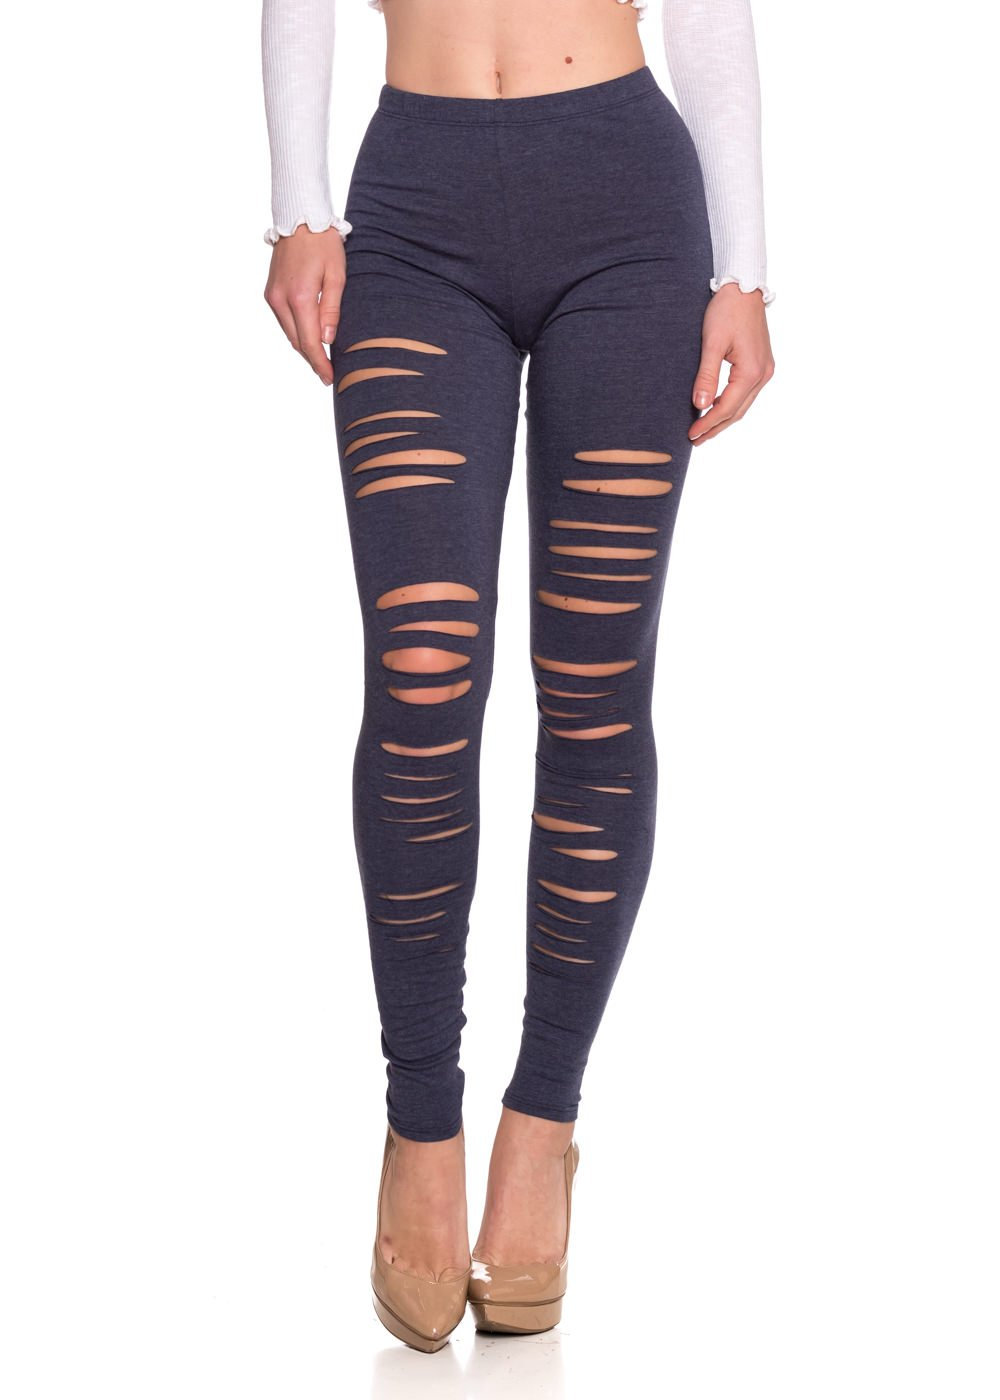 Cemi Ceri Women's J2 Love Ripped Cotton Legging, Medium, Heather Navy